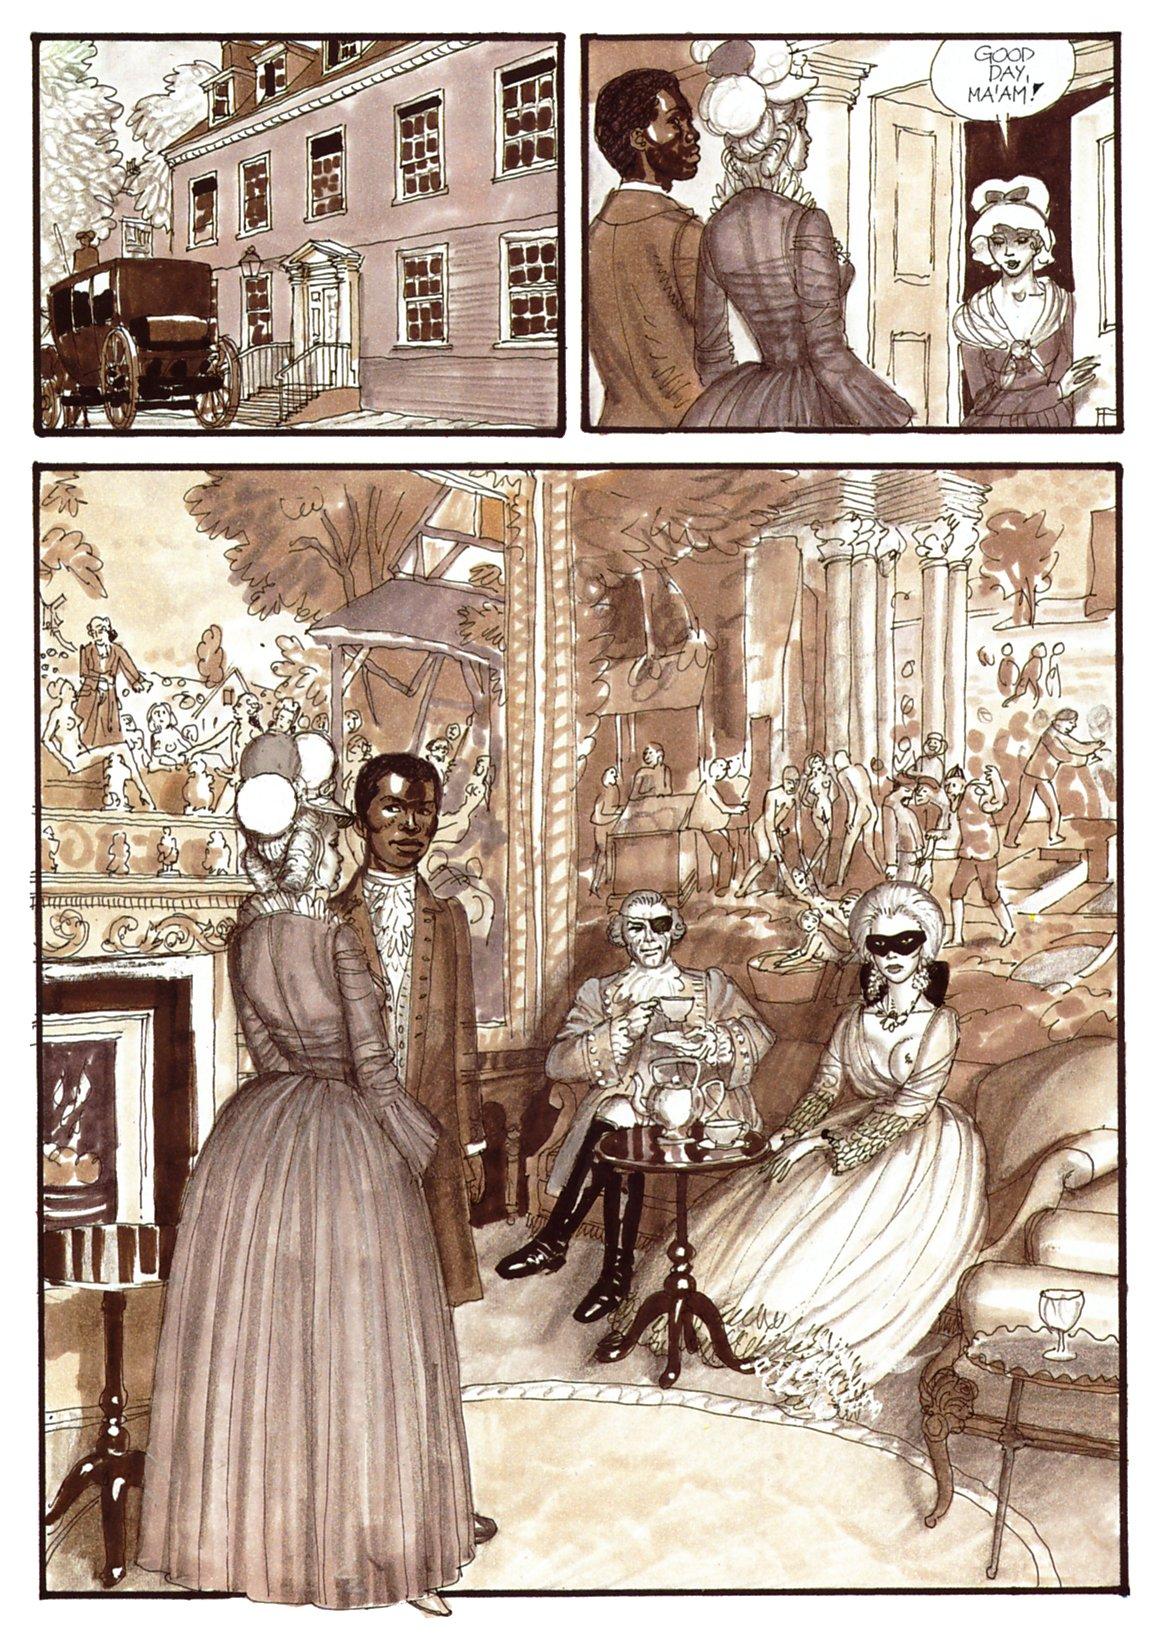 The Troubles of Janice 1 by Erich von Gotha